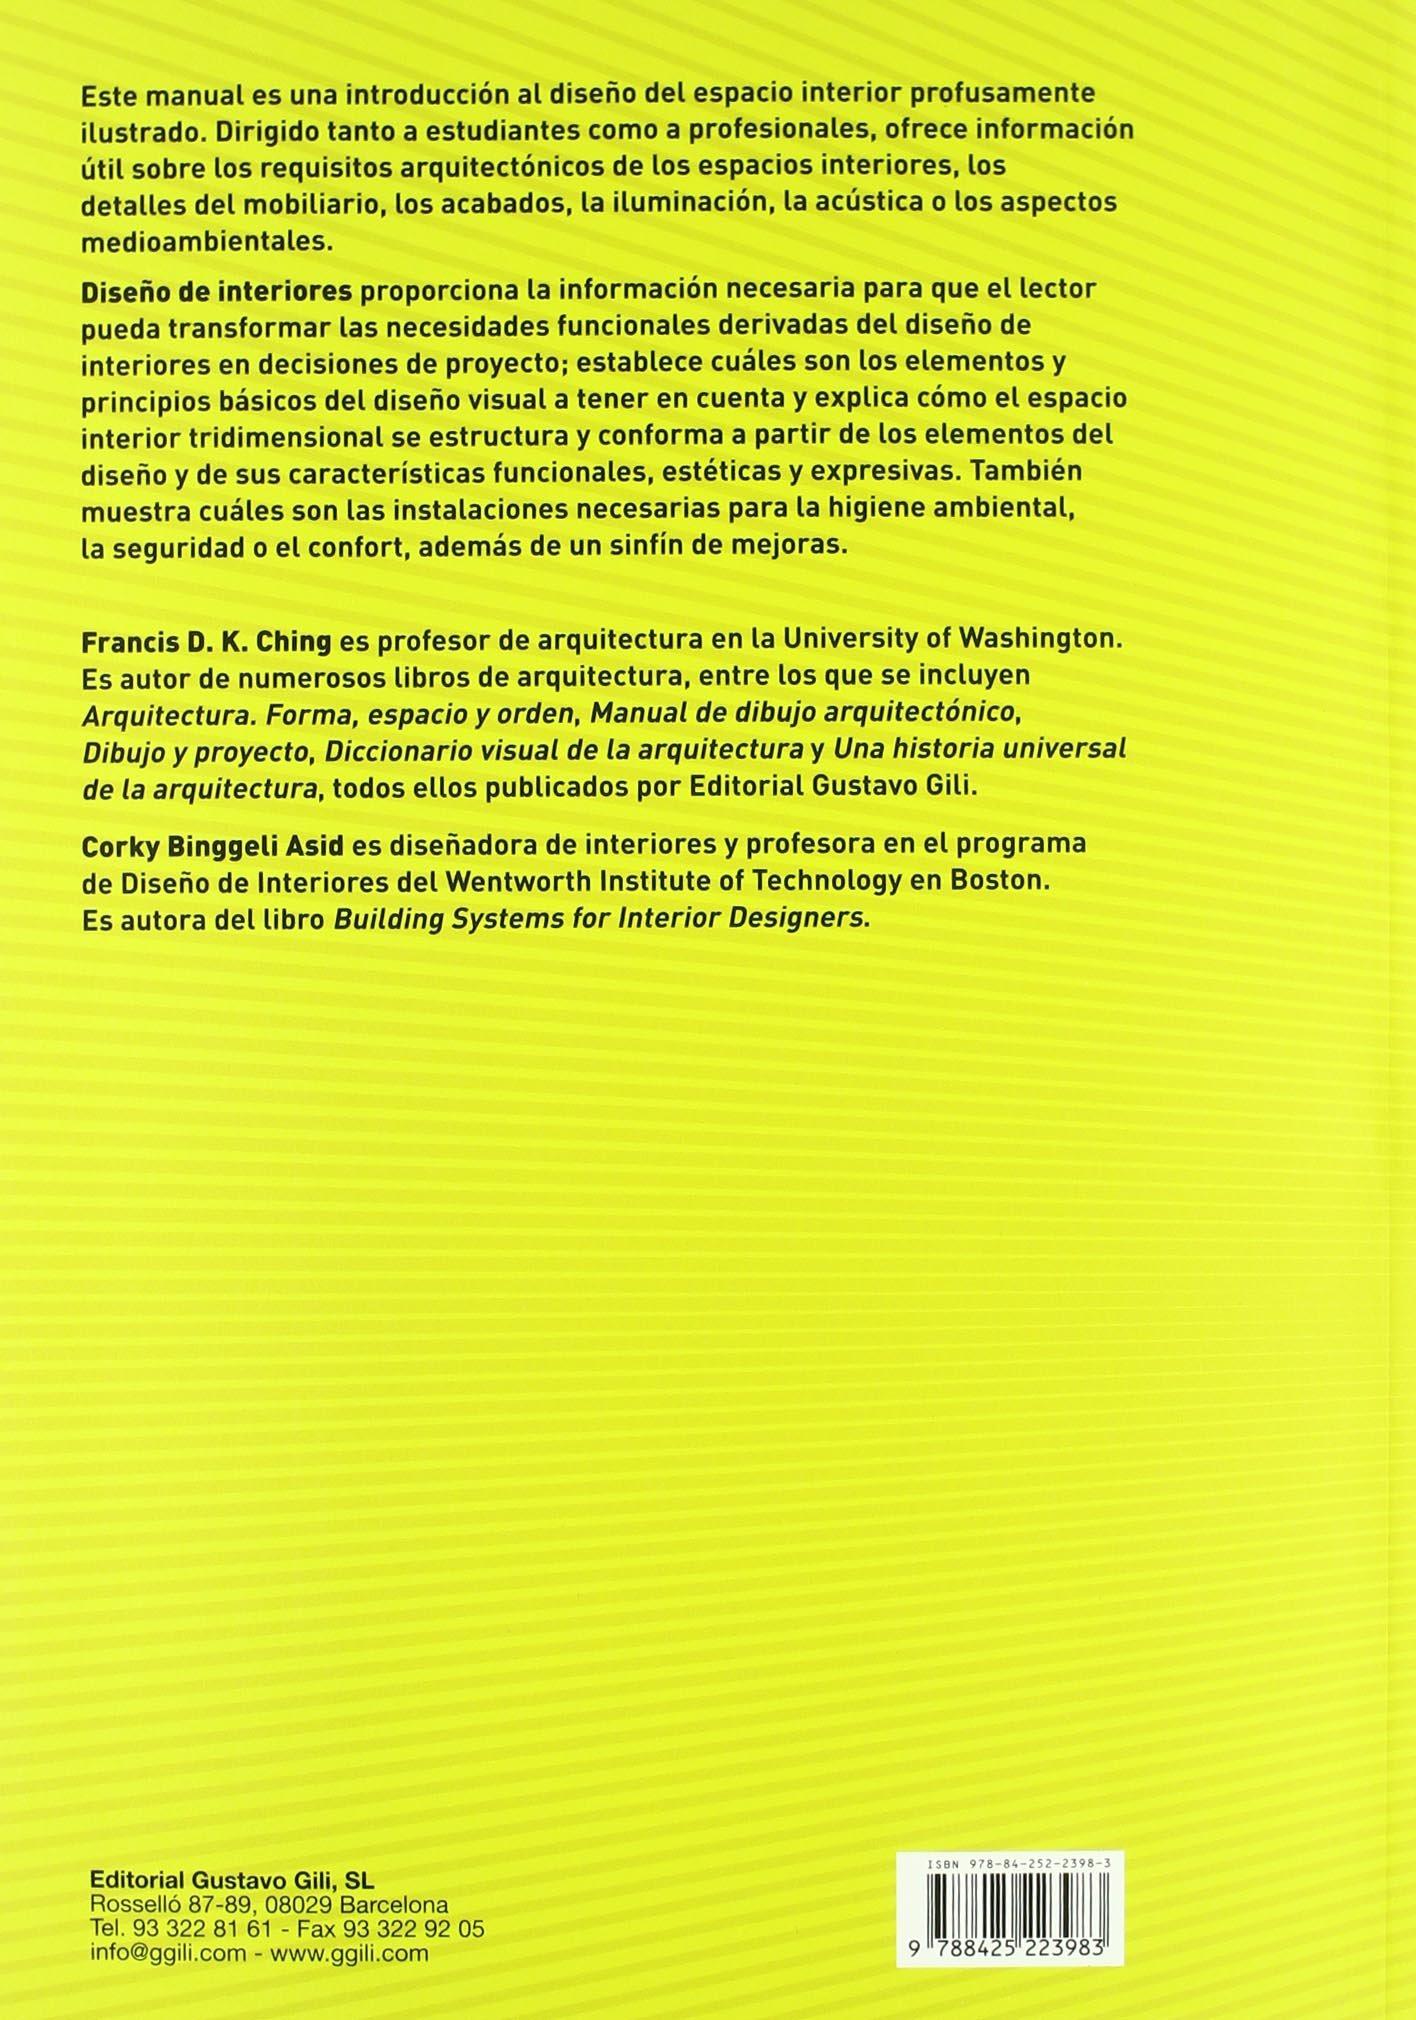 Libros diseo interiores excellent la biblia del diseo for Diseno de interiores un manual pdf